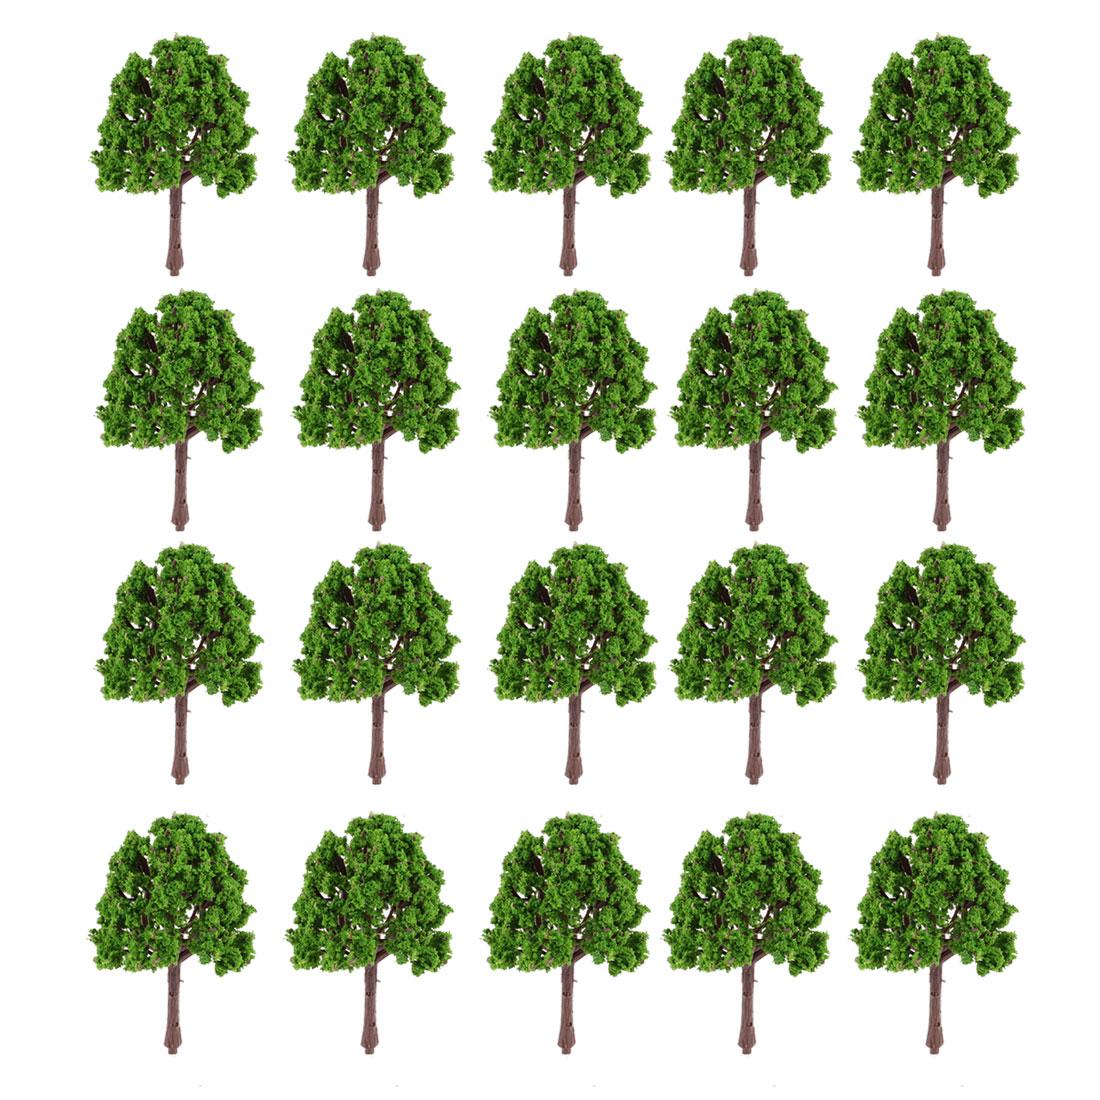 20Pcs Artificial Plastic Green Leaf Tree Decoration 7cm High 1:200